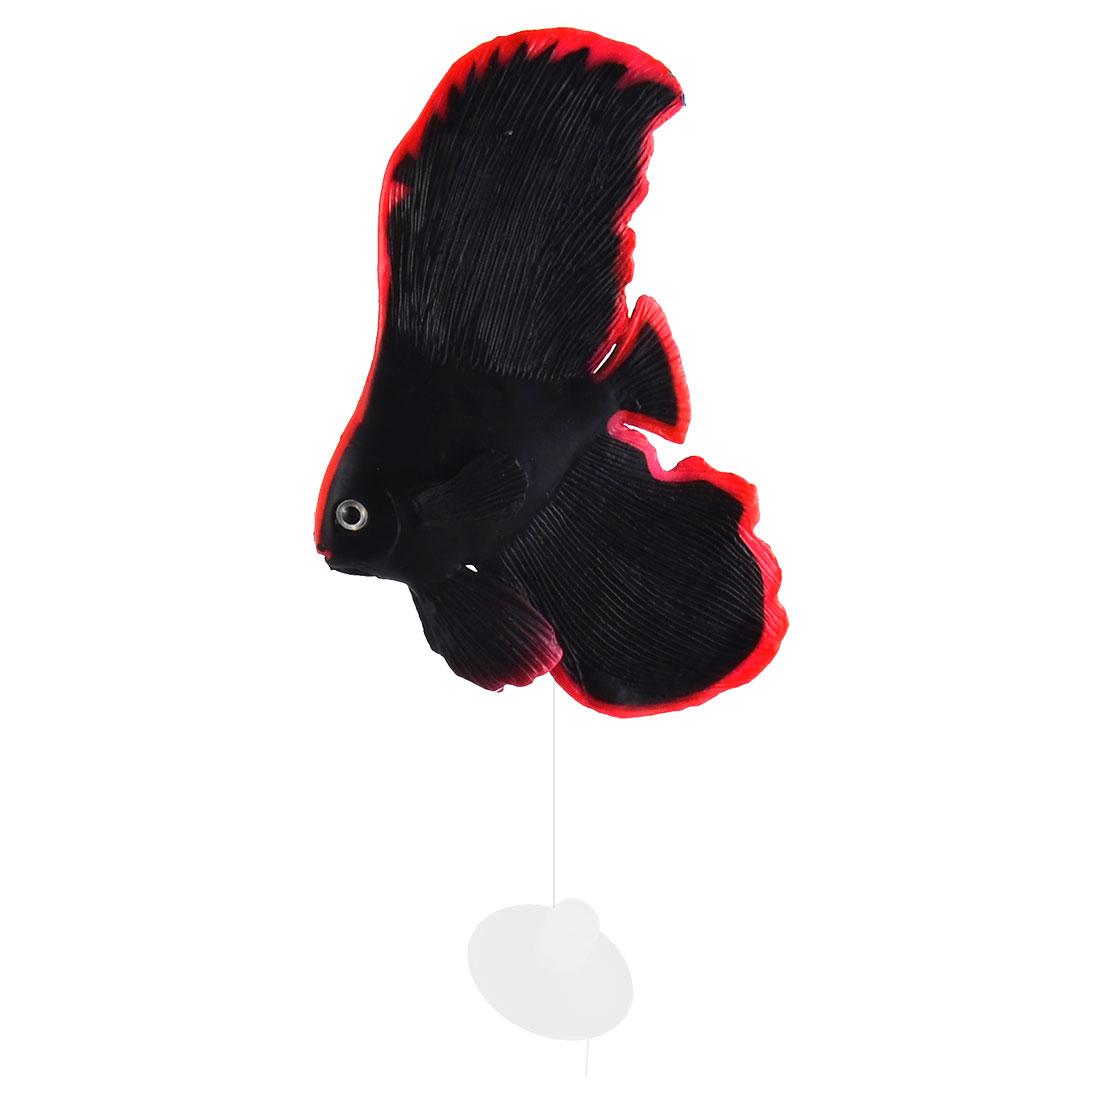 Aquarium Silicone Artificial Emulation Glowing Tropical Sea Fish Ornament Black